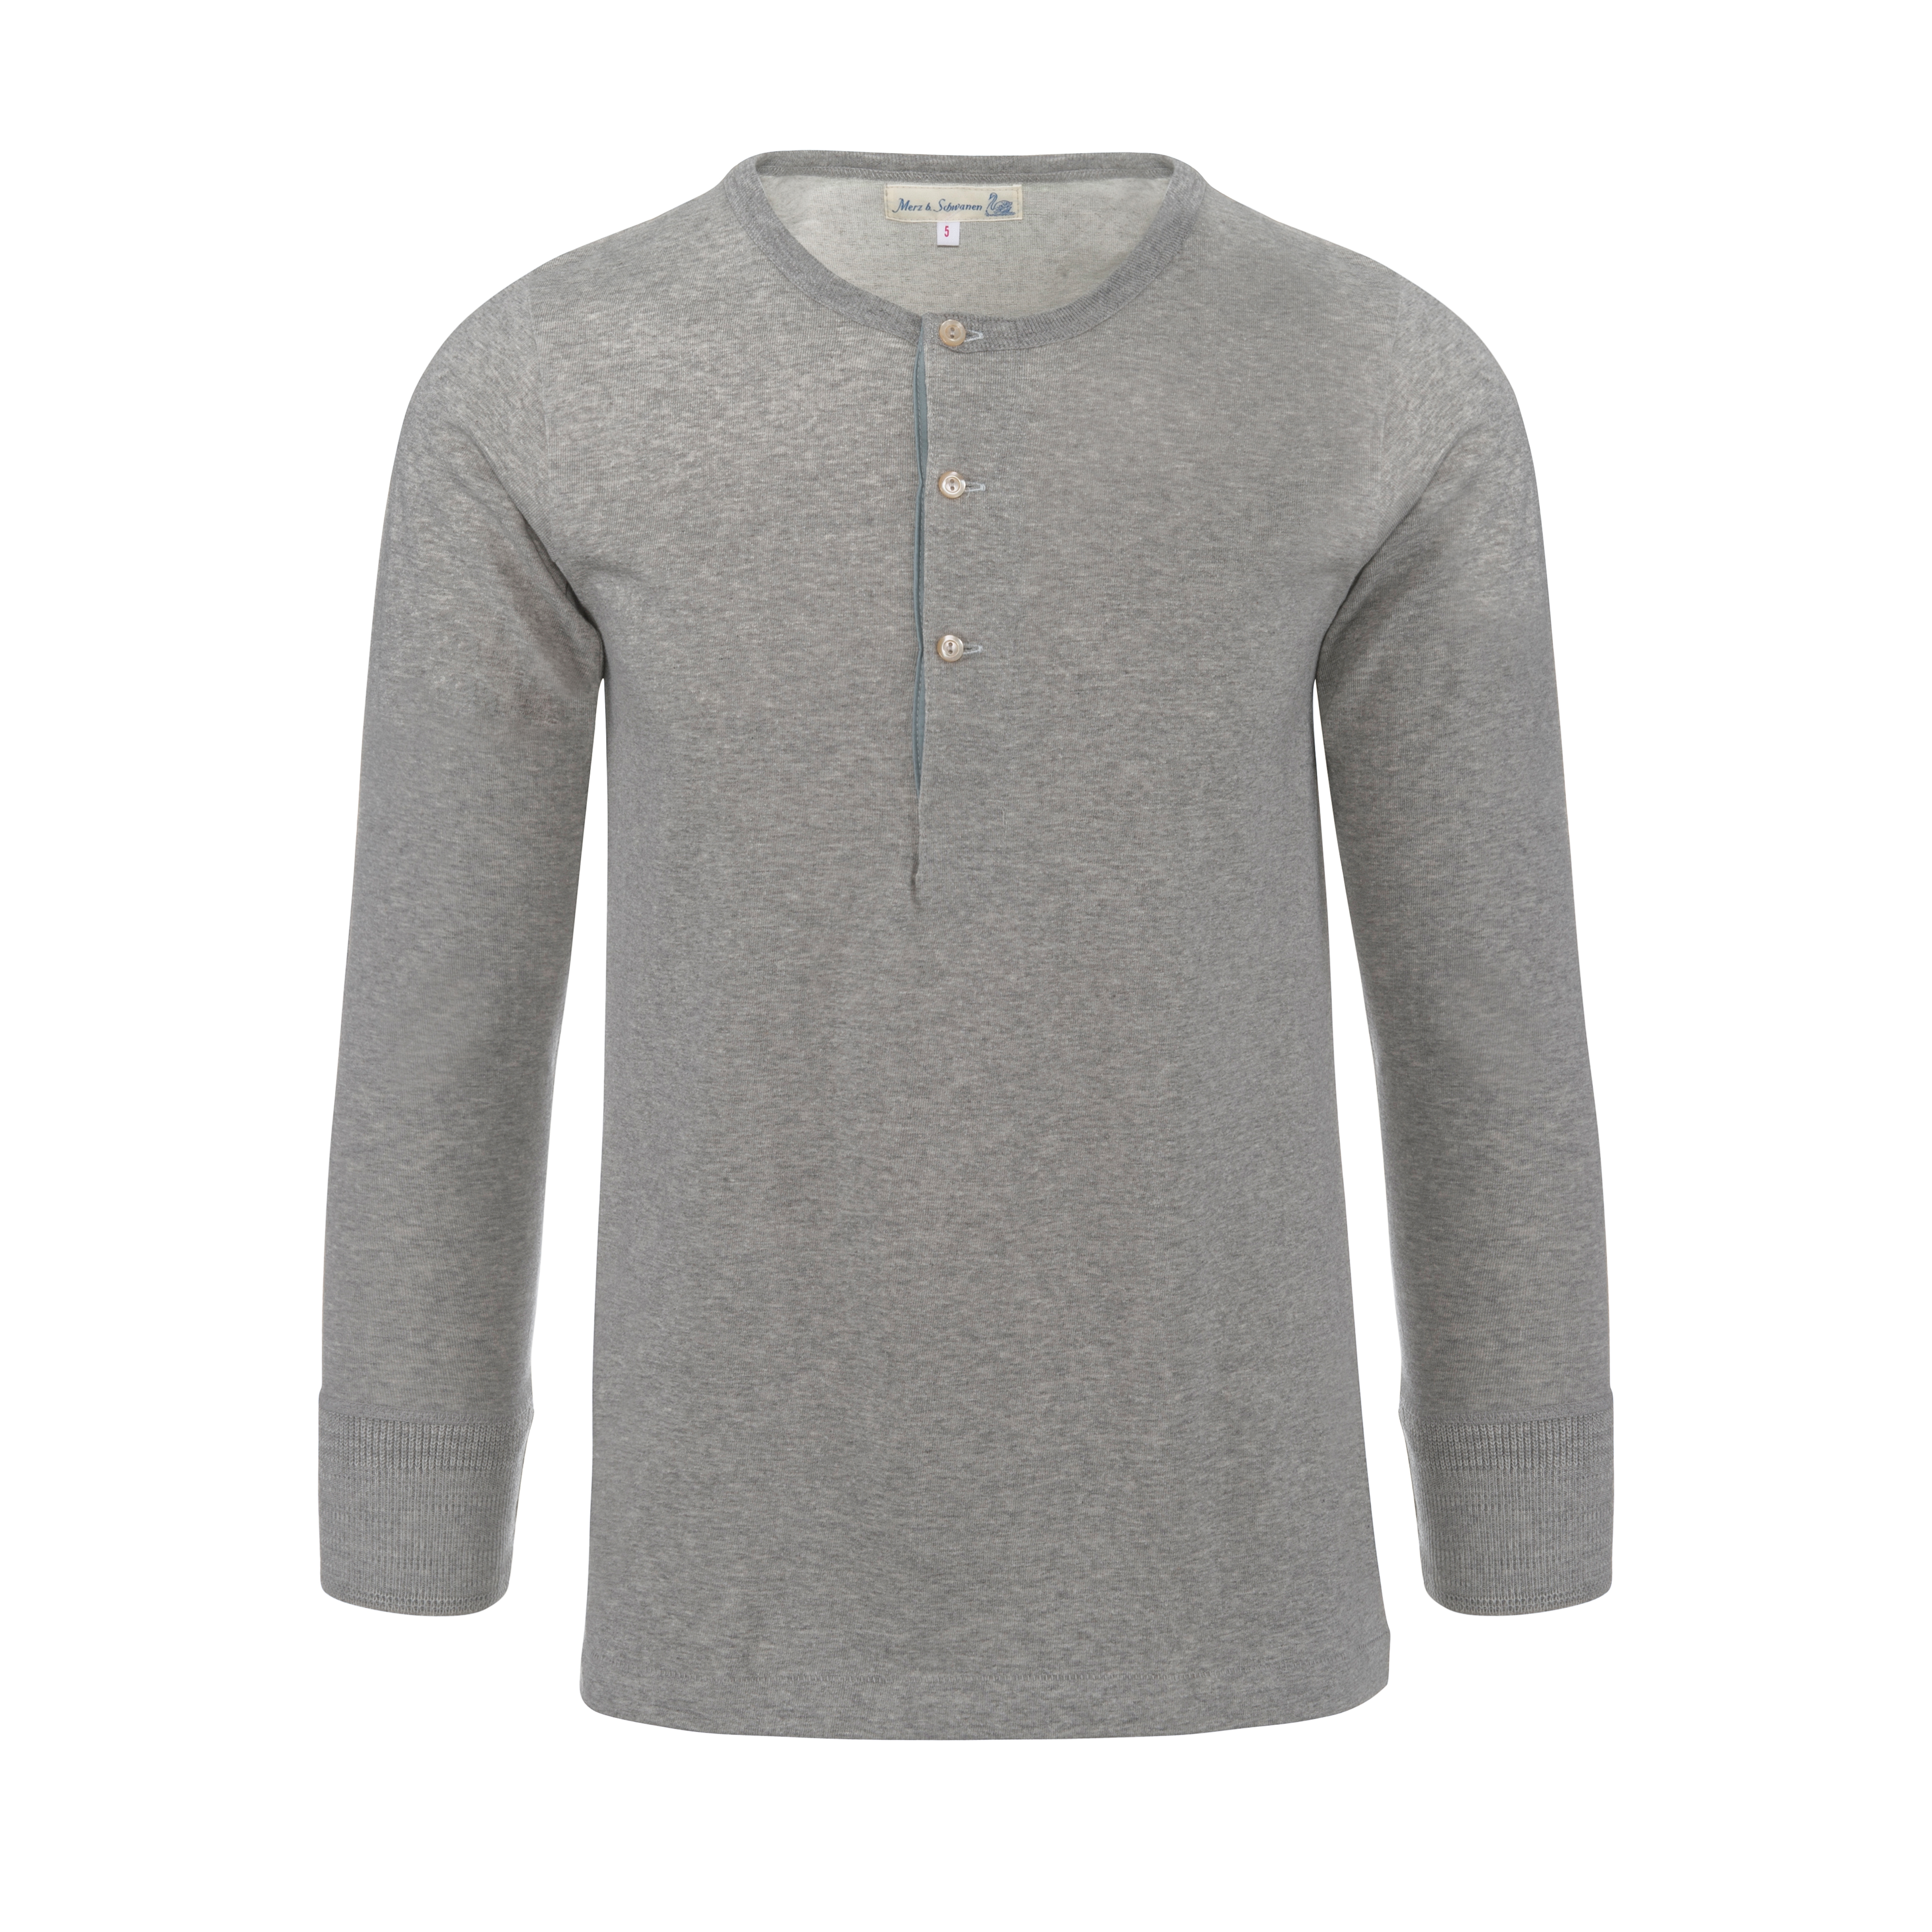 Henley 206 Longsleeve Grey Melange